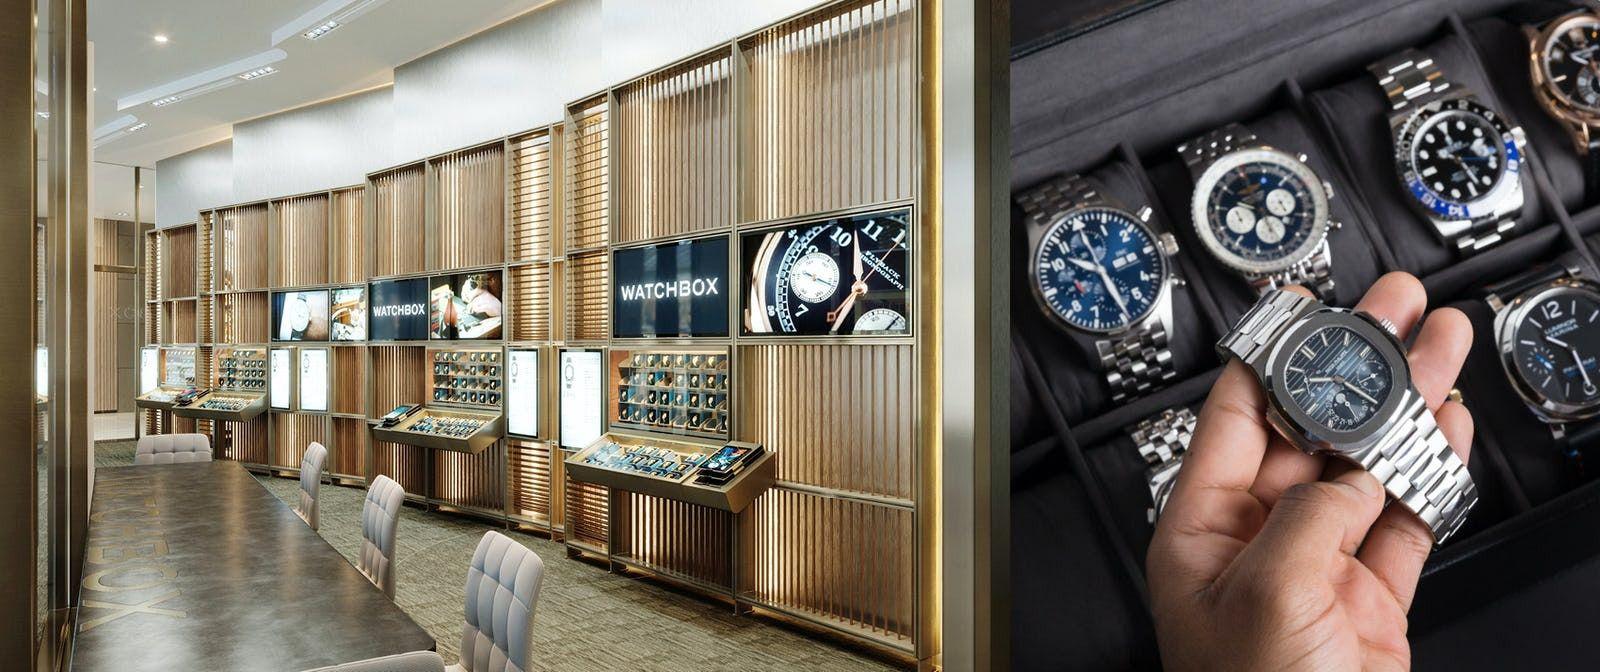 A WatchBox store in Dubai.